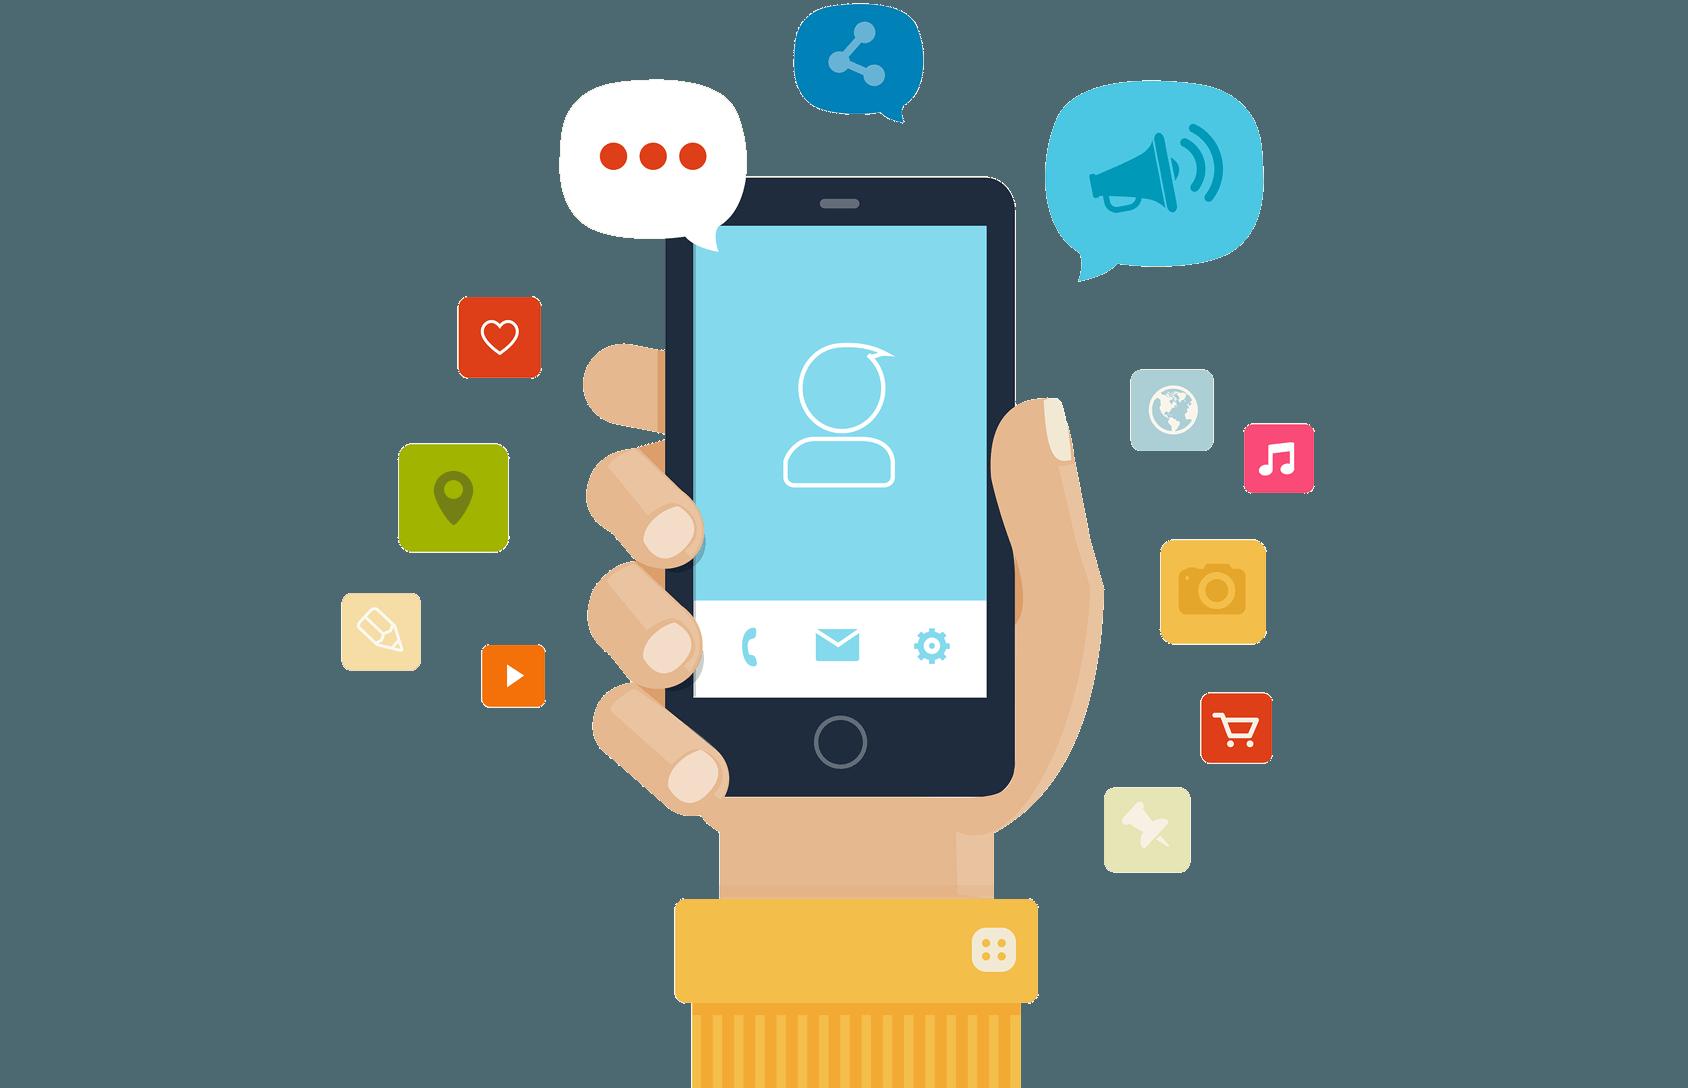 kisspng-computer-icons-mobile-app-development-icon-design-mobile-apps-5acc9fcc471f25.2610141415233596922913.png